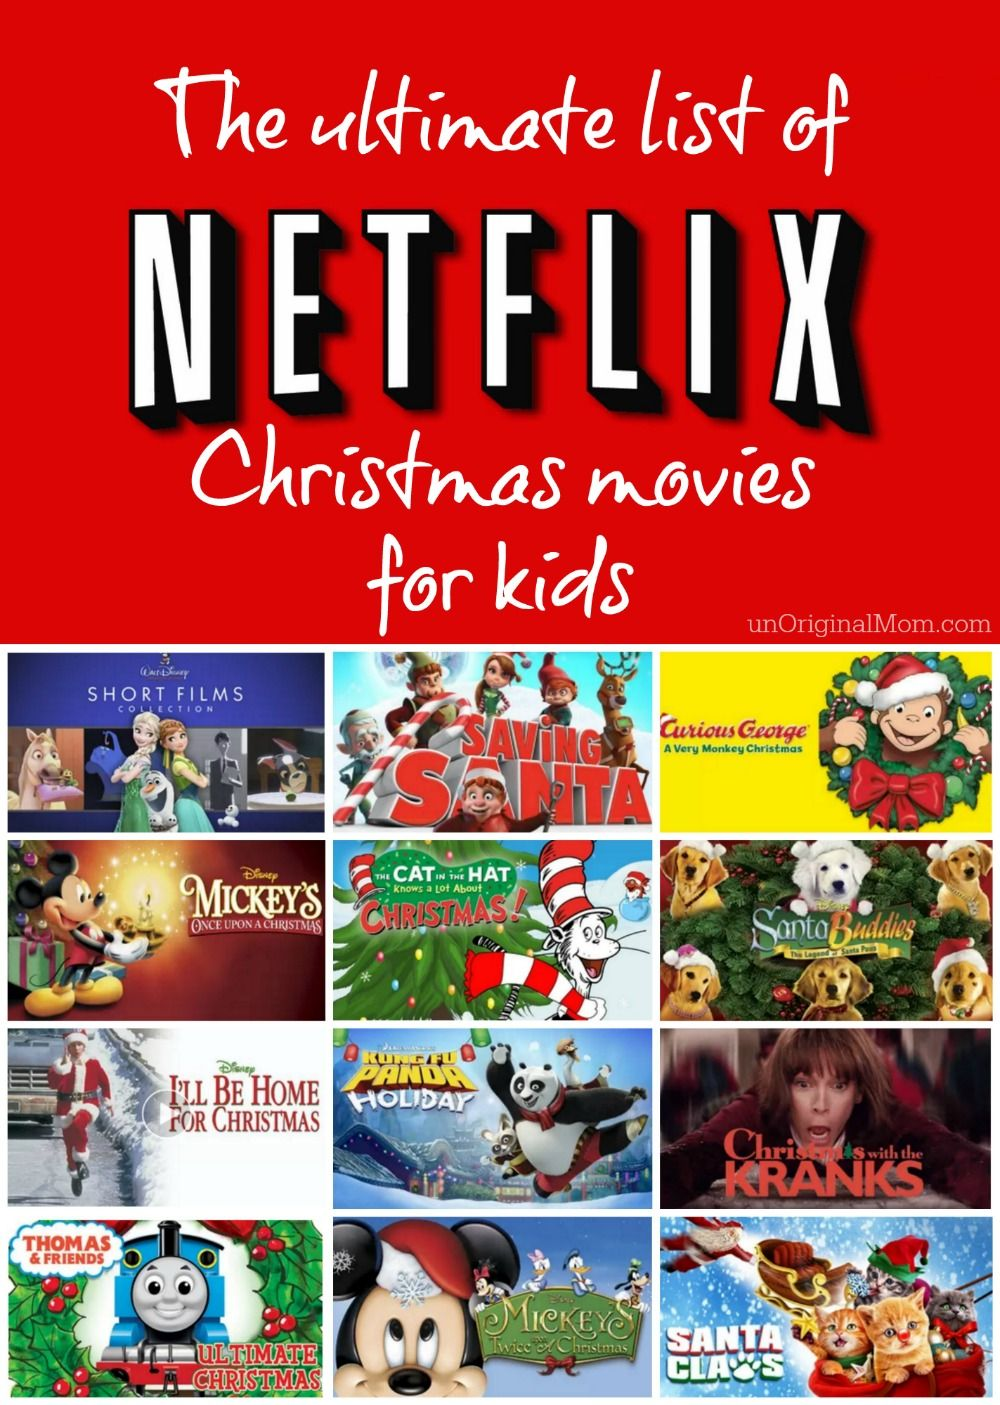 Netflix Christmas Movies for Kids | Pinterest | Netflix, Movie and ...